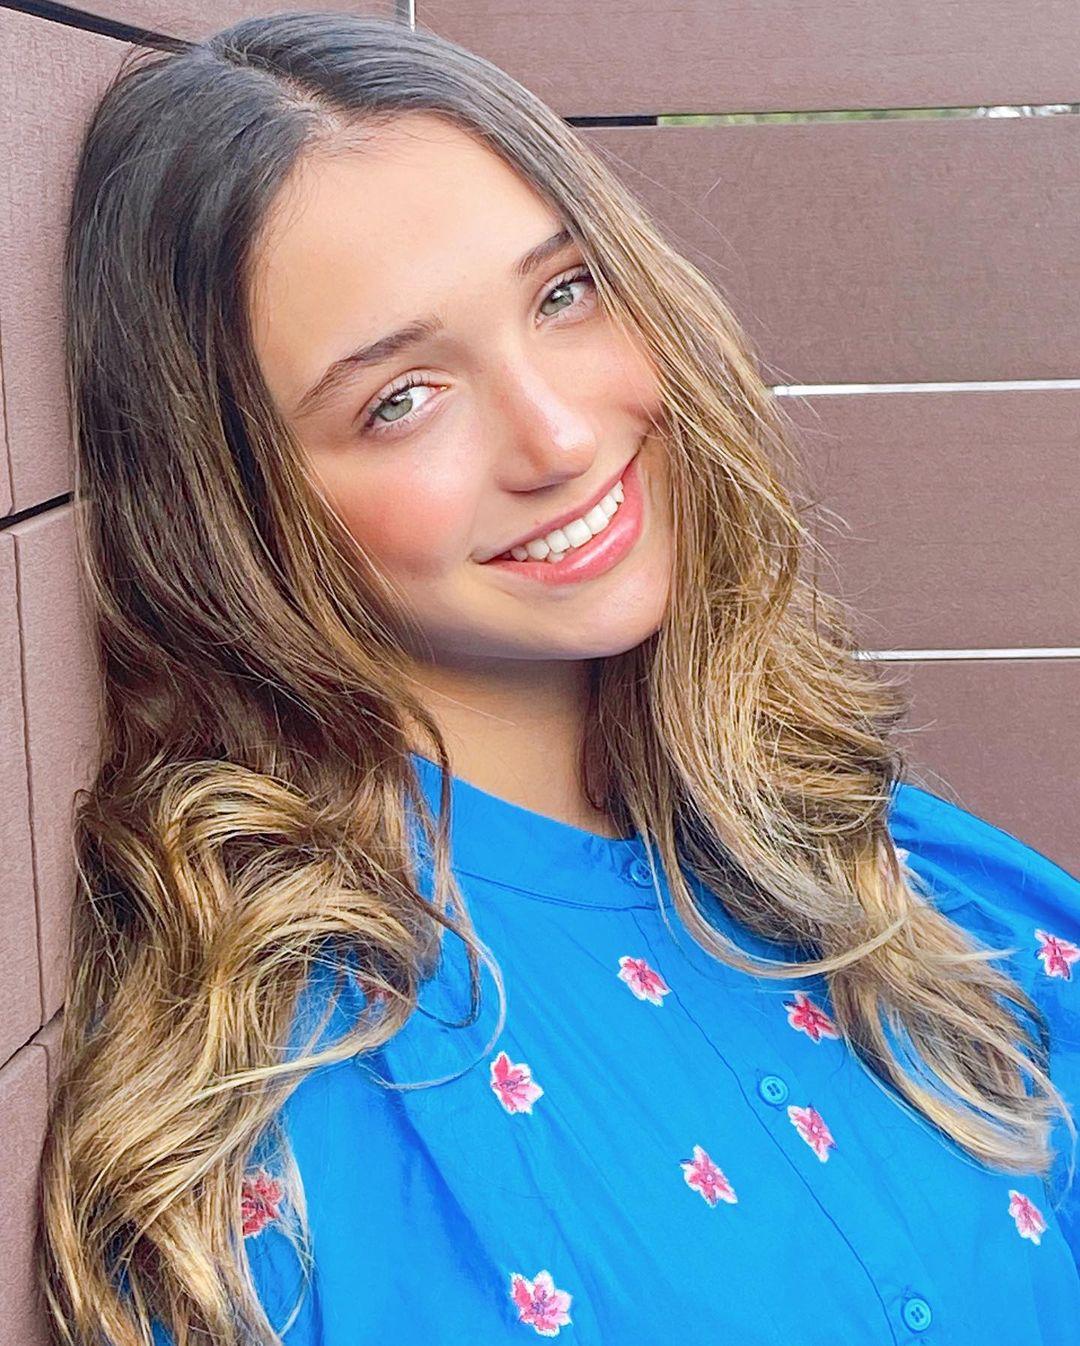 Andrea Legarreta entrevista a su hija Nina